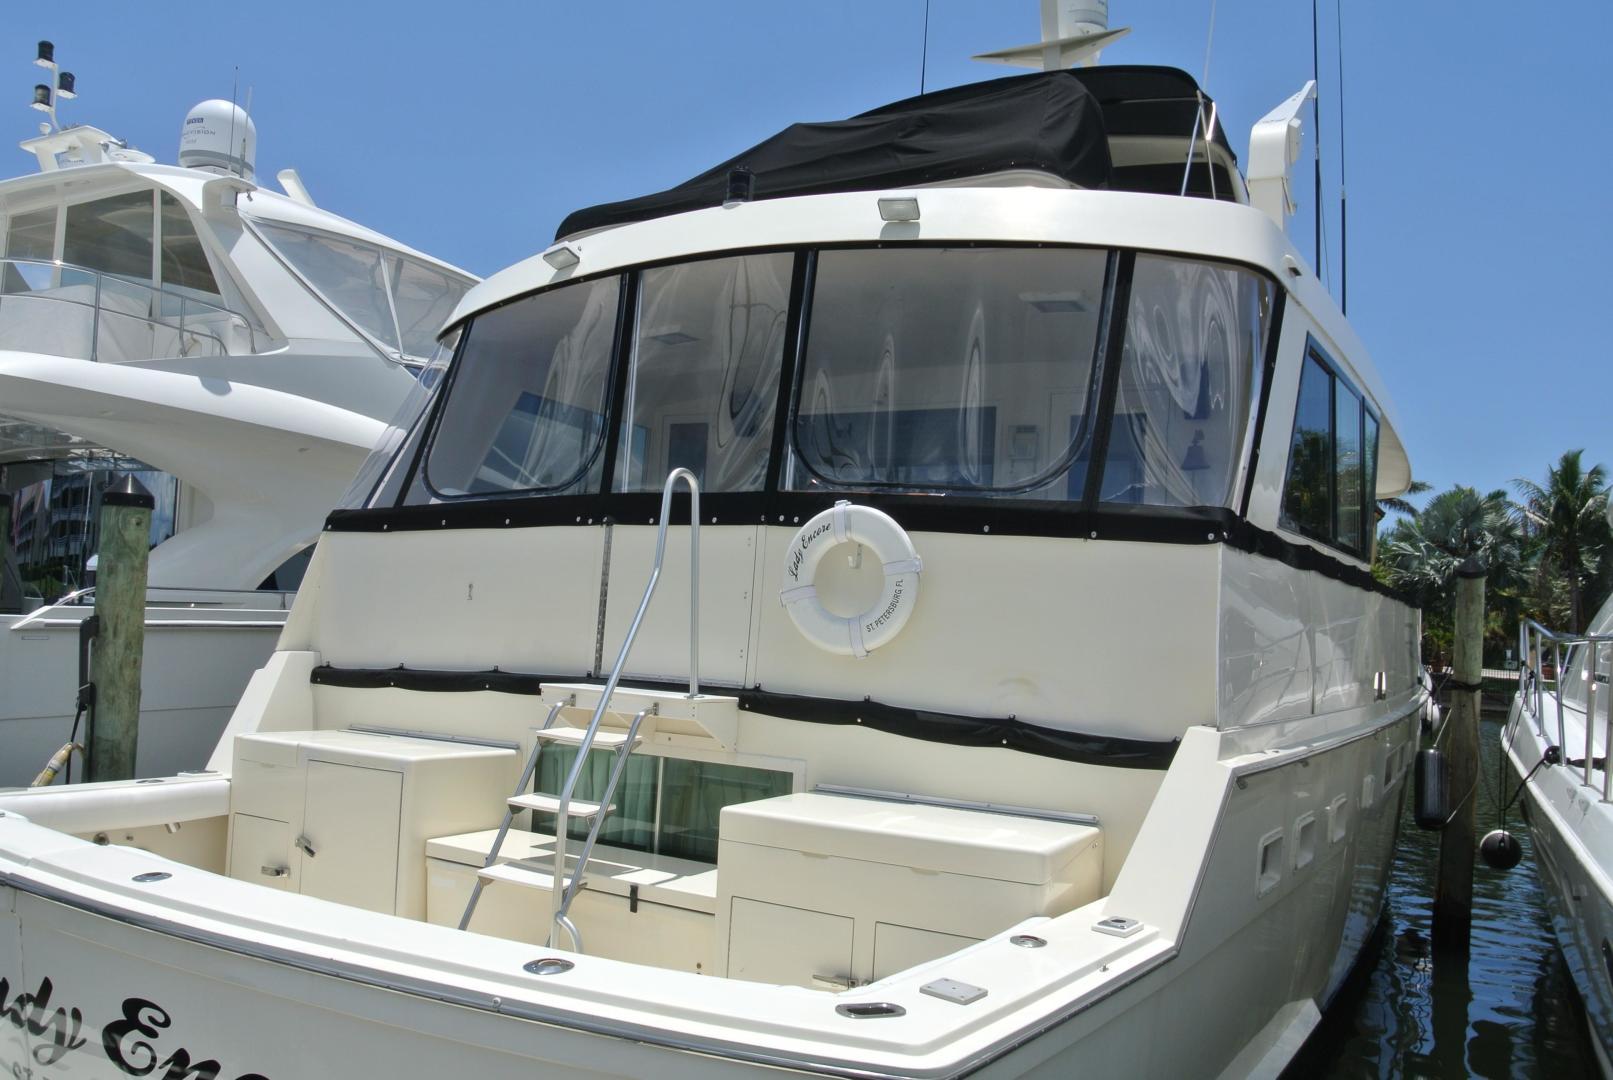 Hatteras-67-Cockpit-Motor-Yacht-1988-Lady-Encore-Saint-Petersburg-Florida-United-States-Aft-926171